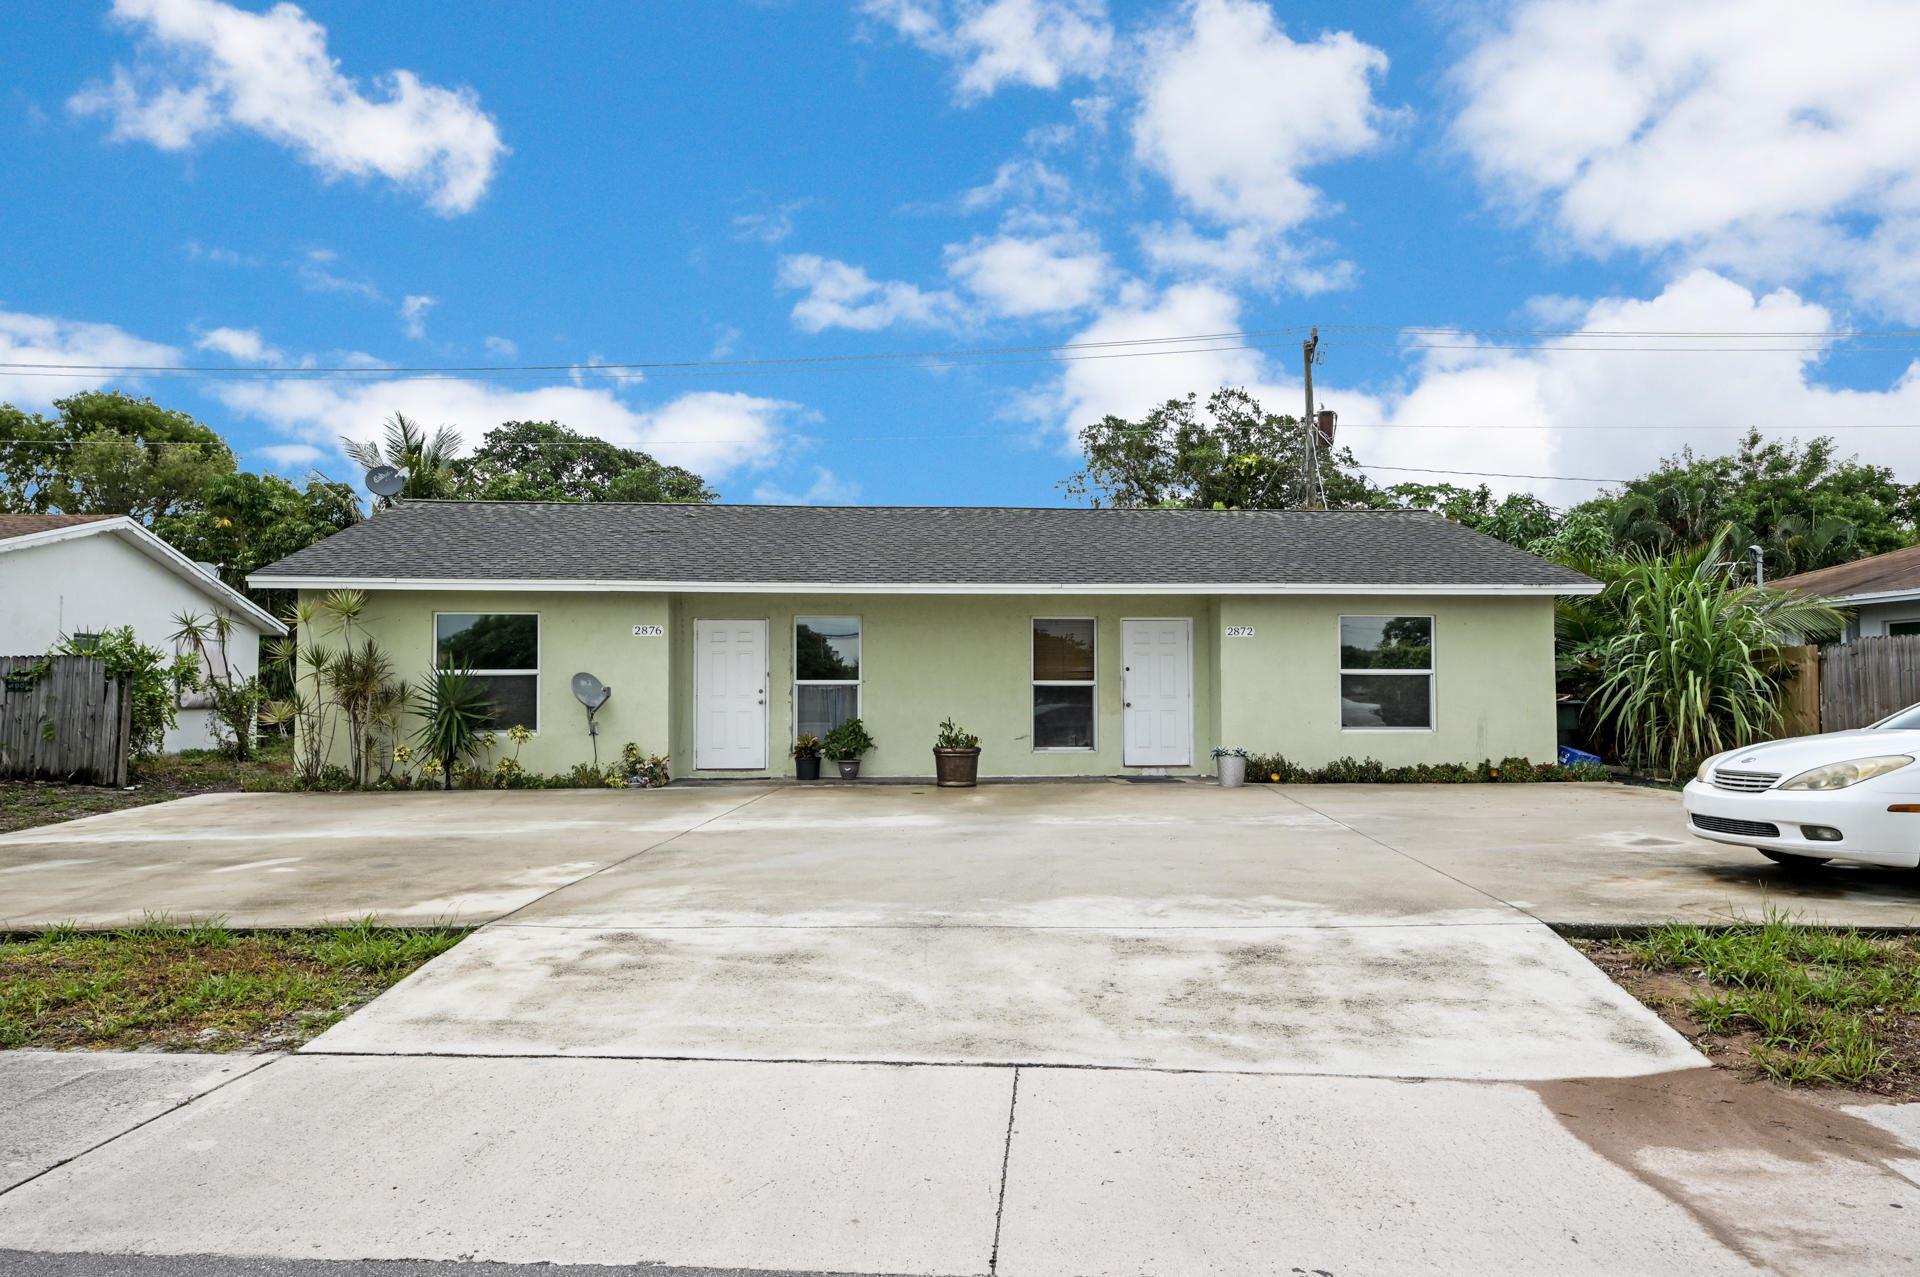 2872 N Dixie Highway, Boca Raton, FL 33431 - MLS#: RX-10728041